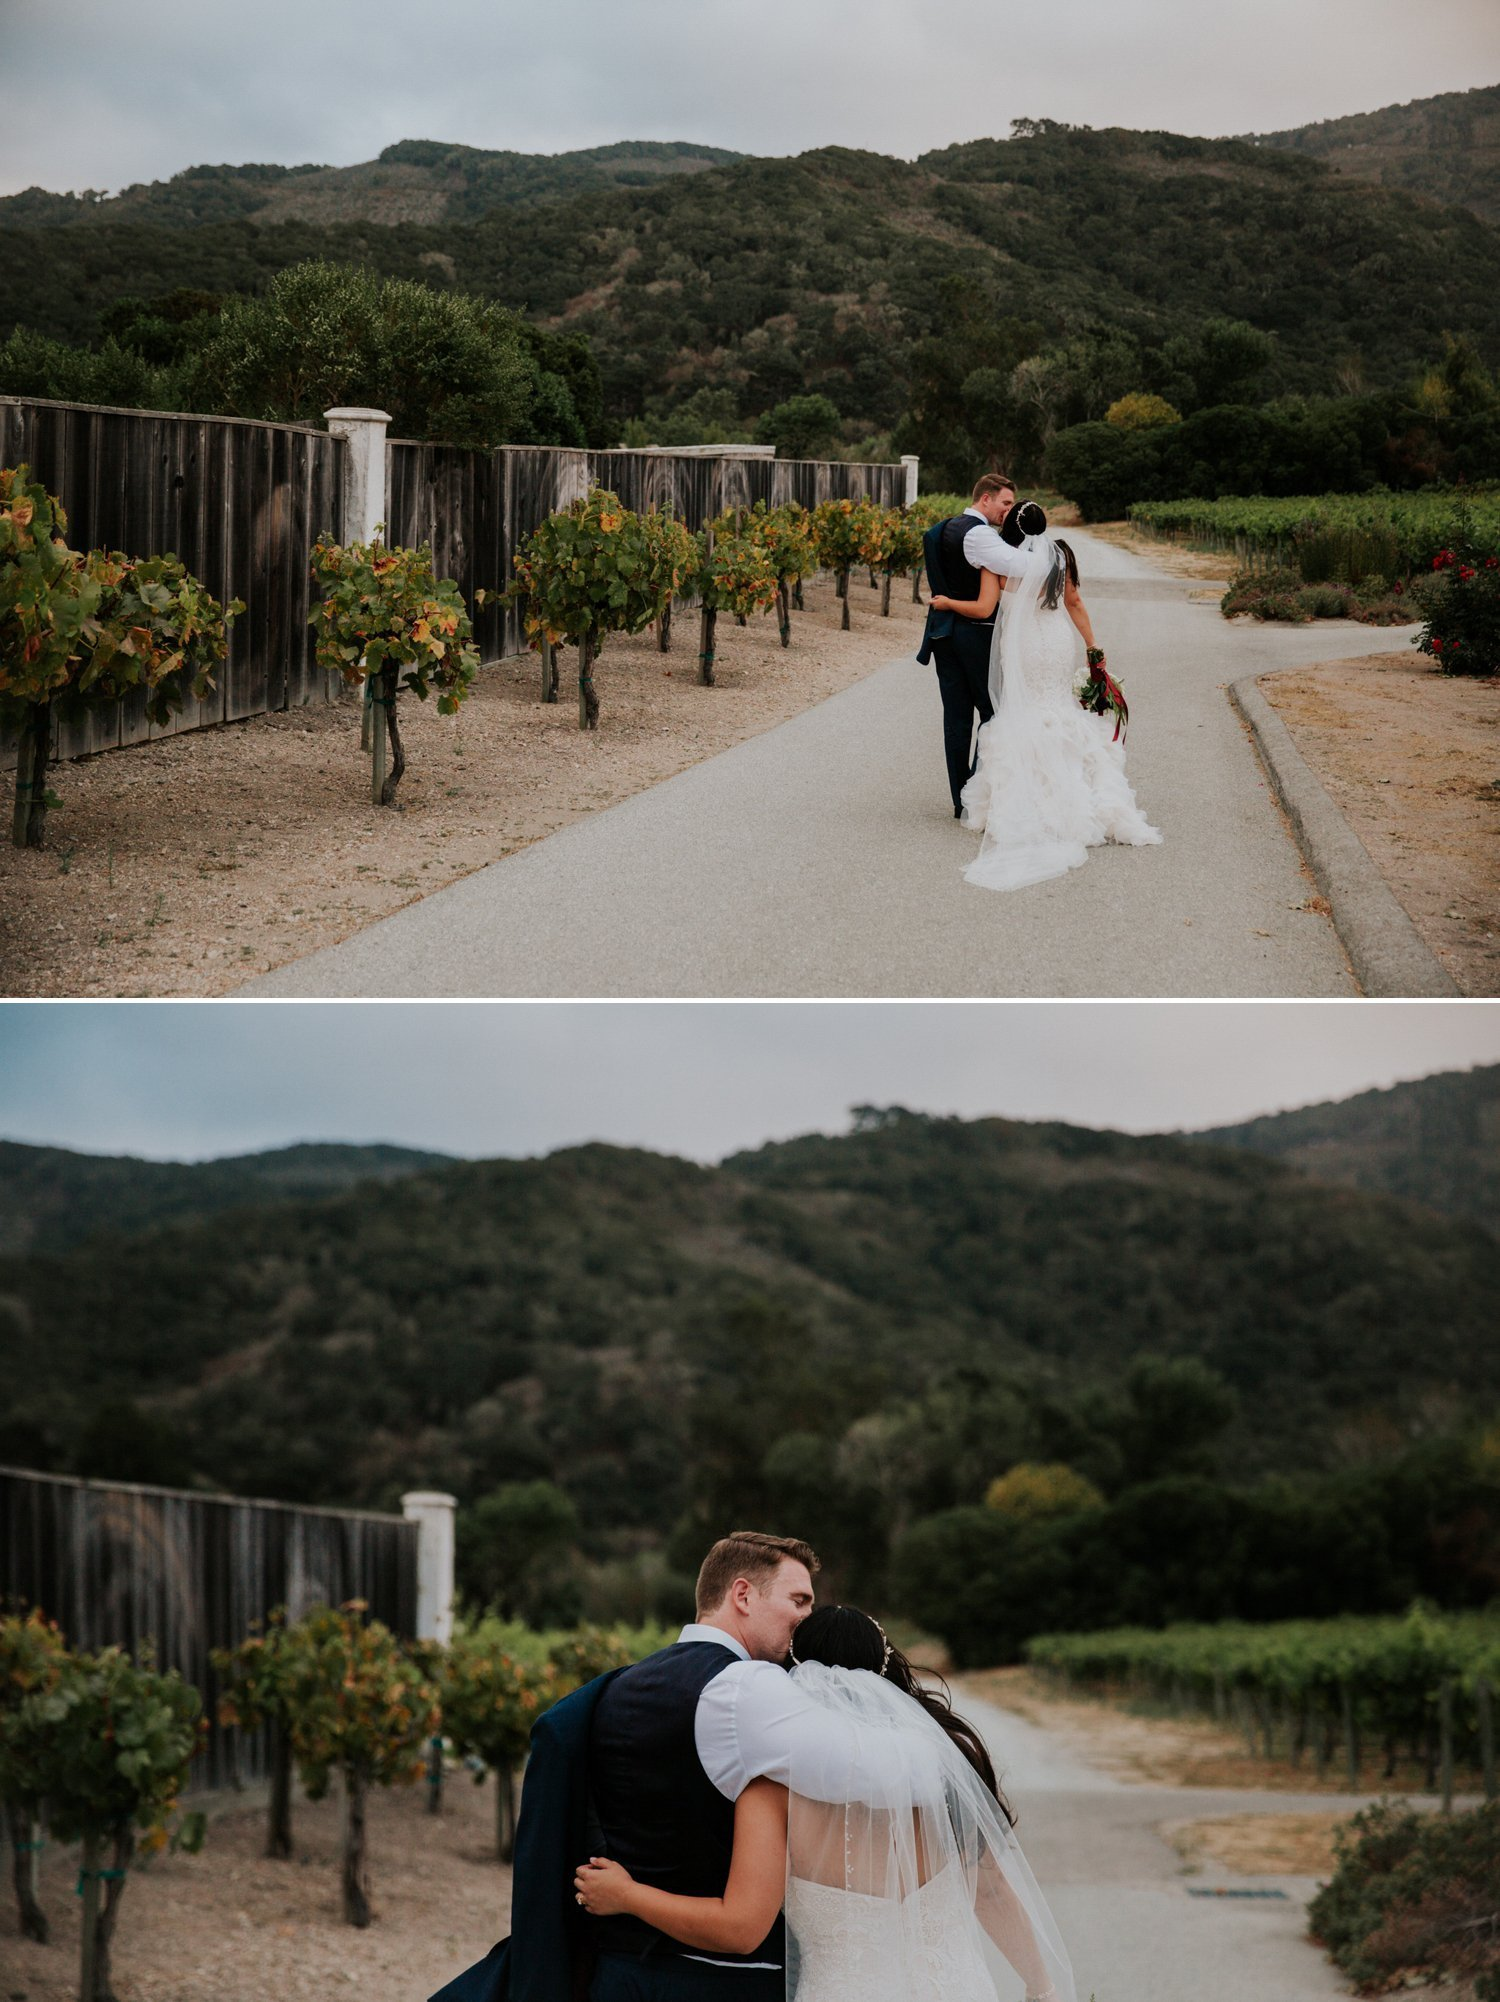 Carmel wedding at vineyard Paige Nelson